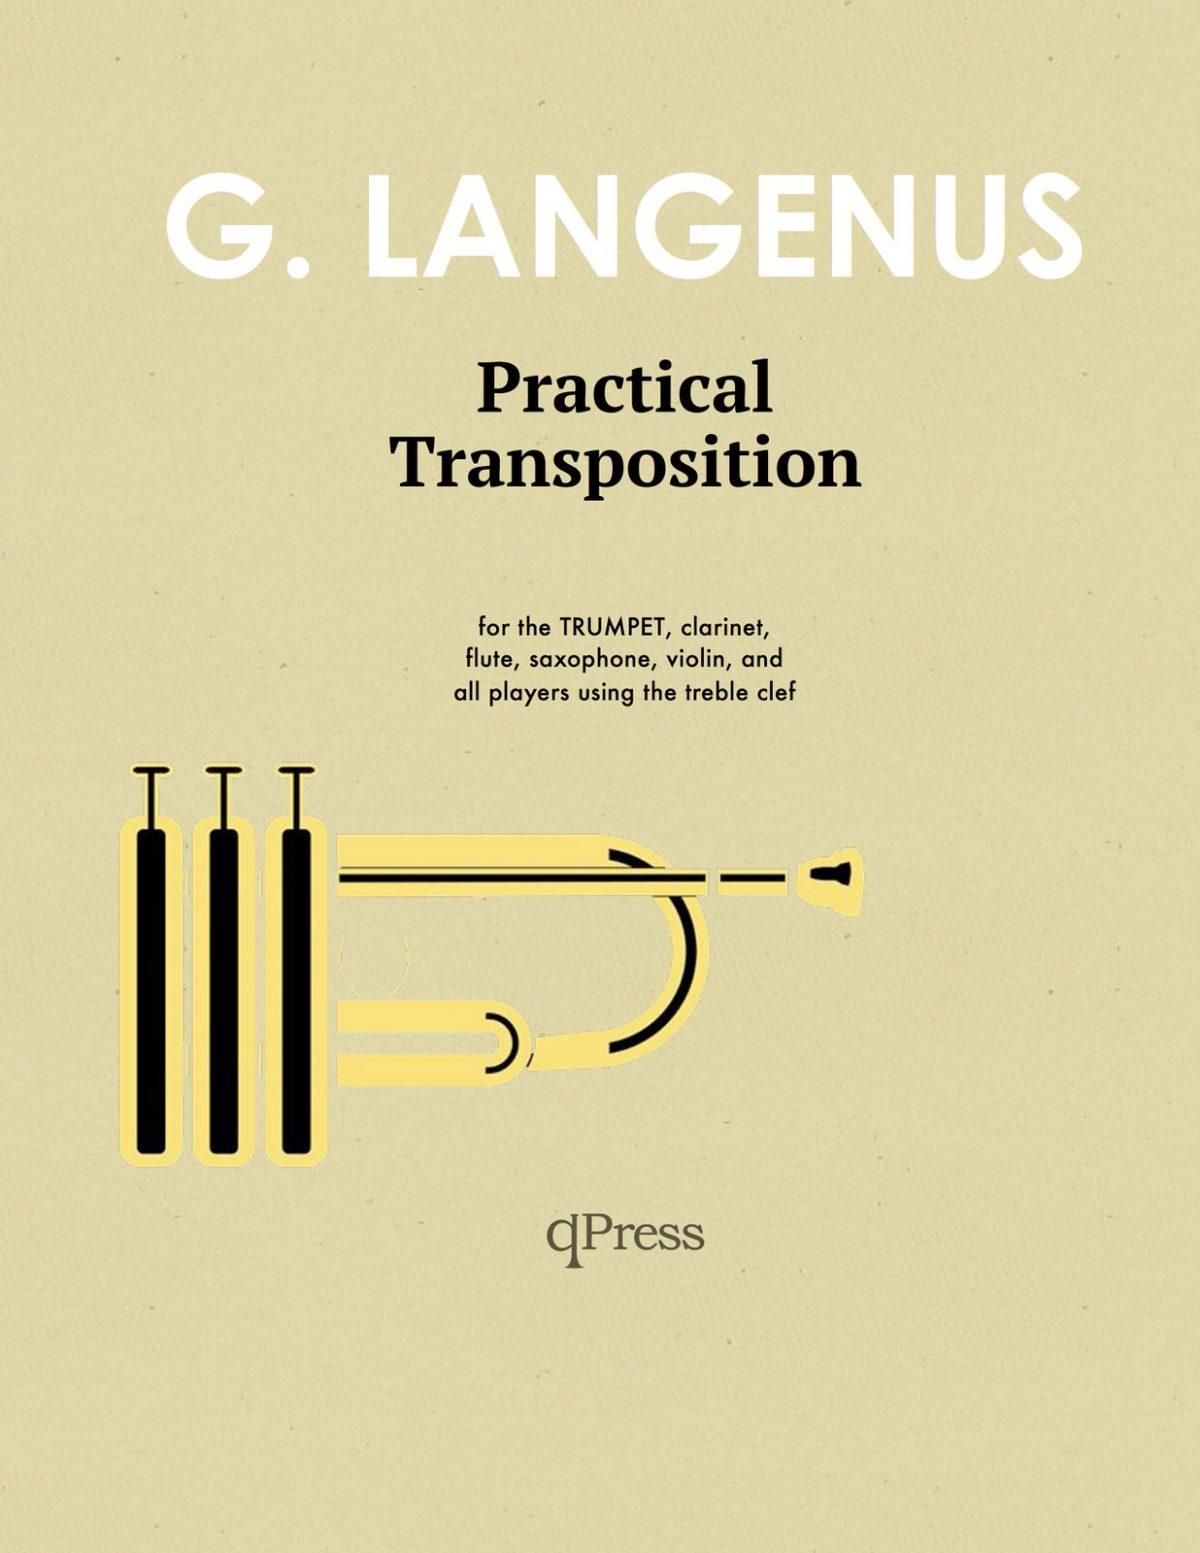 Langenus, Gustave, Practical Transposition for Trumpet-p01